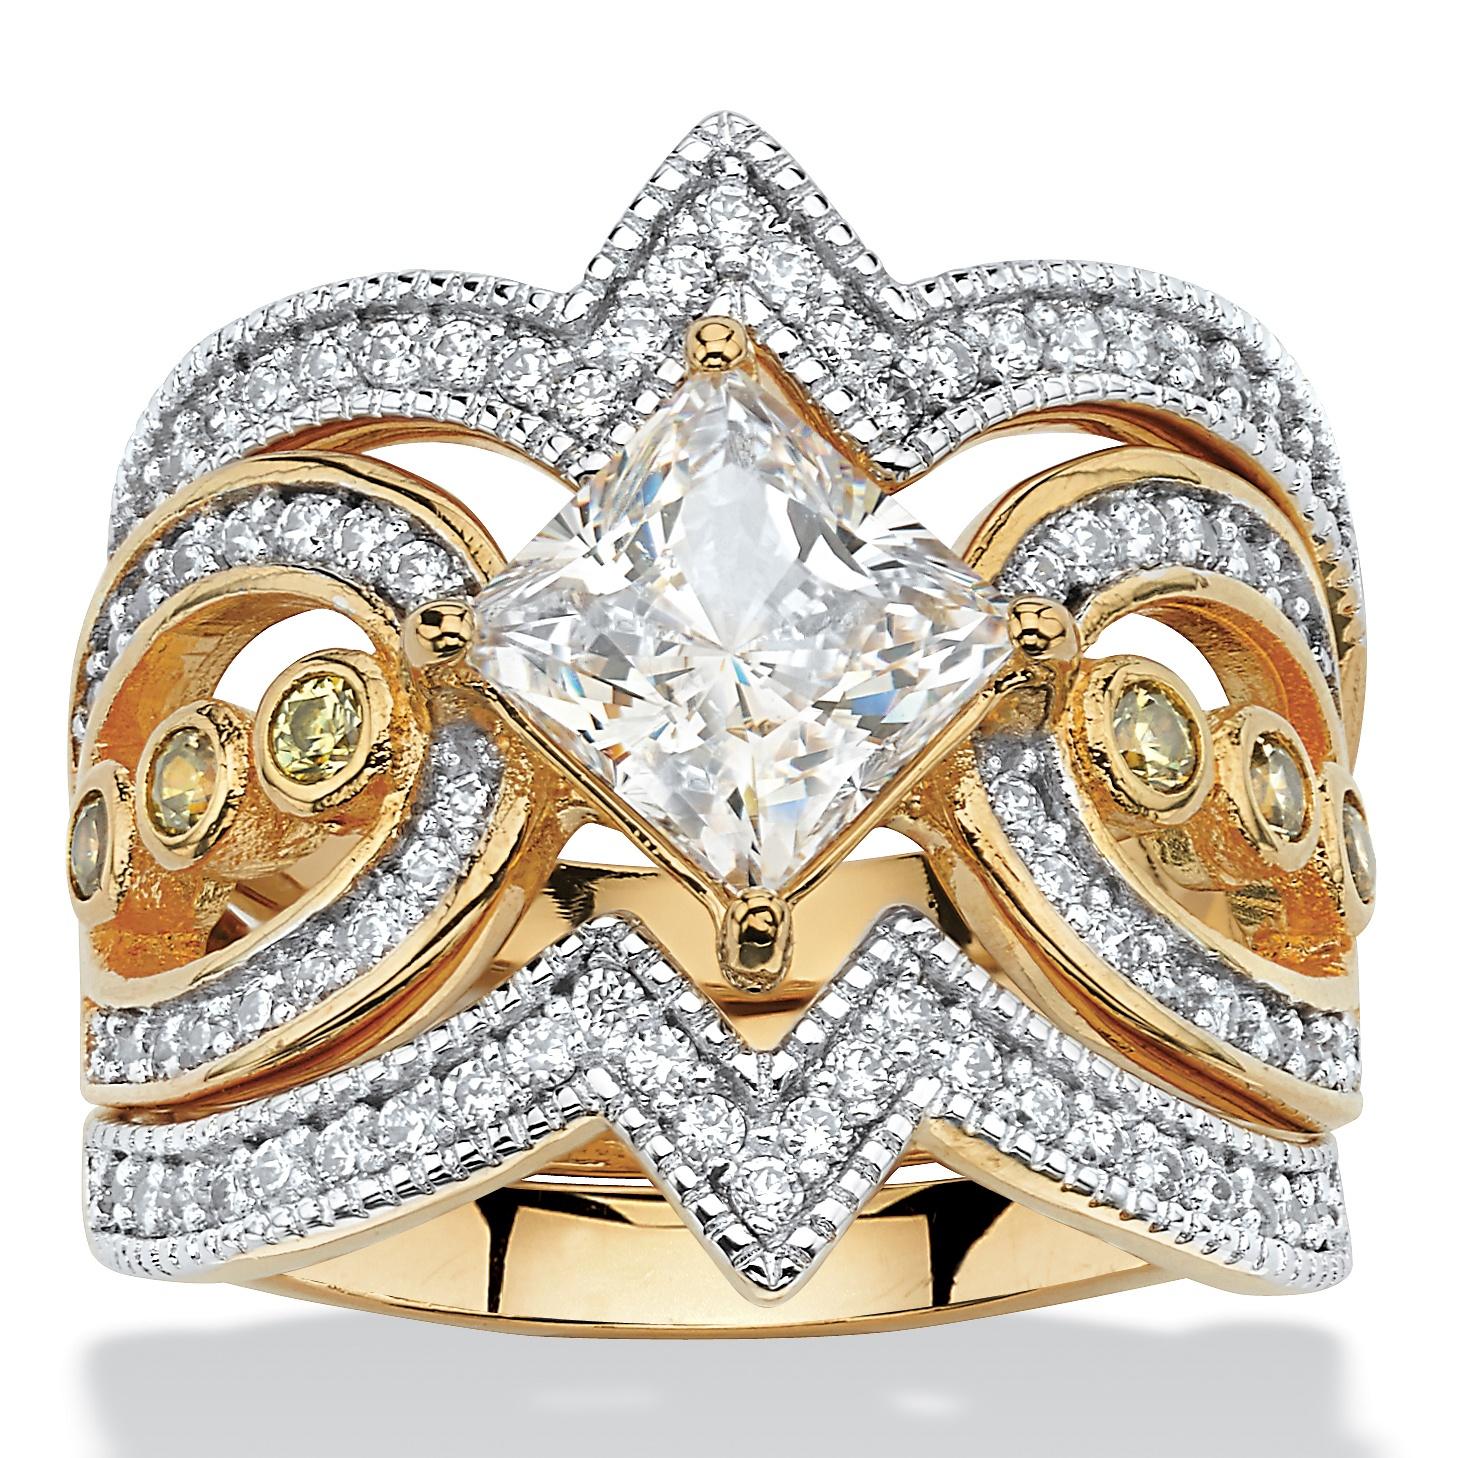 3 Piece 2 19 Tcw Princess Cut Cubic Zirconia Bridal Ring